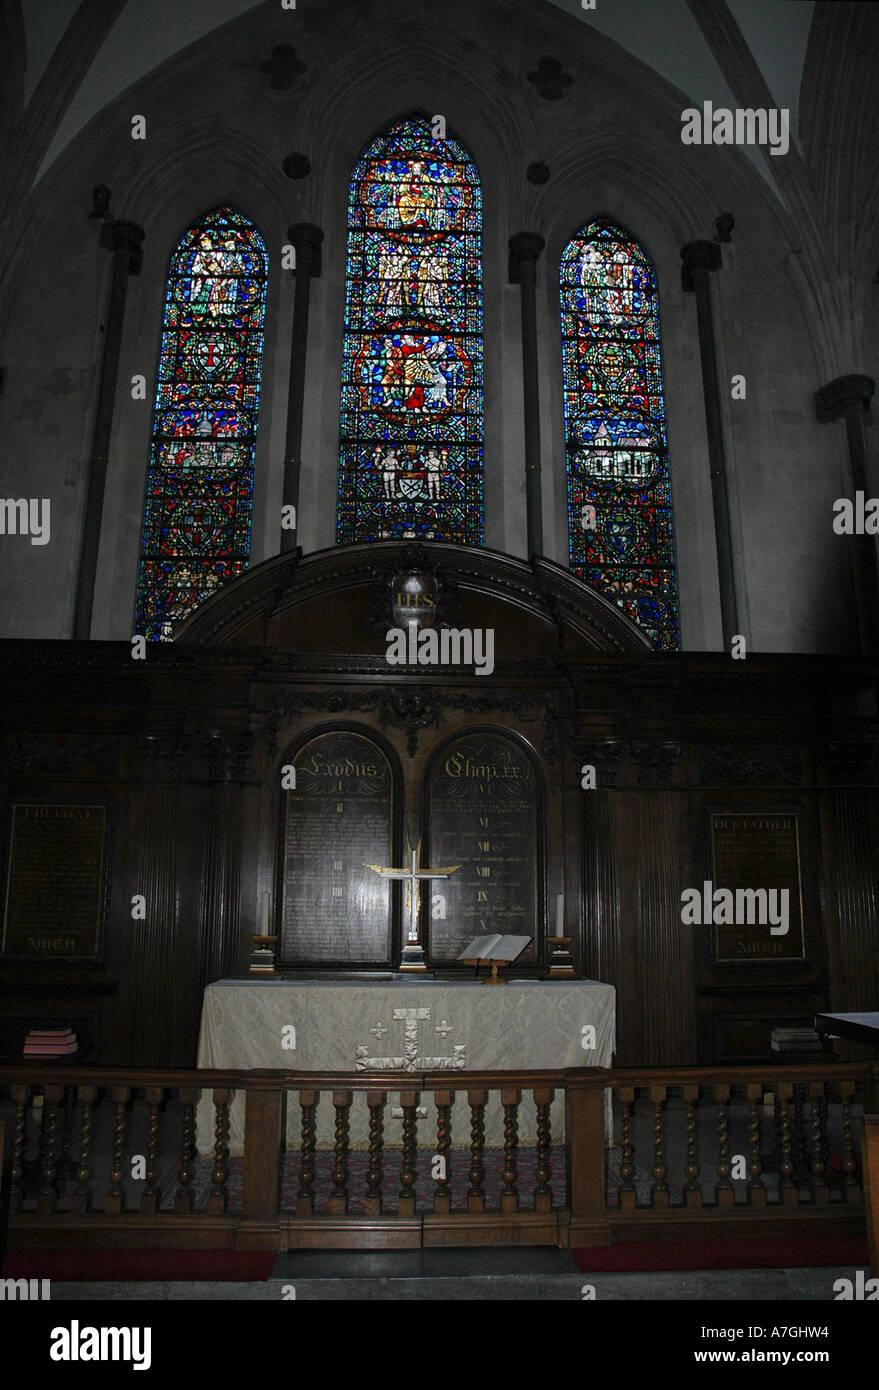 The Temple Church Altar, London, UK. - Stock Image